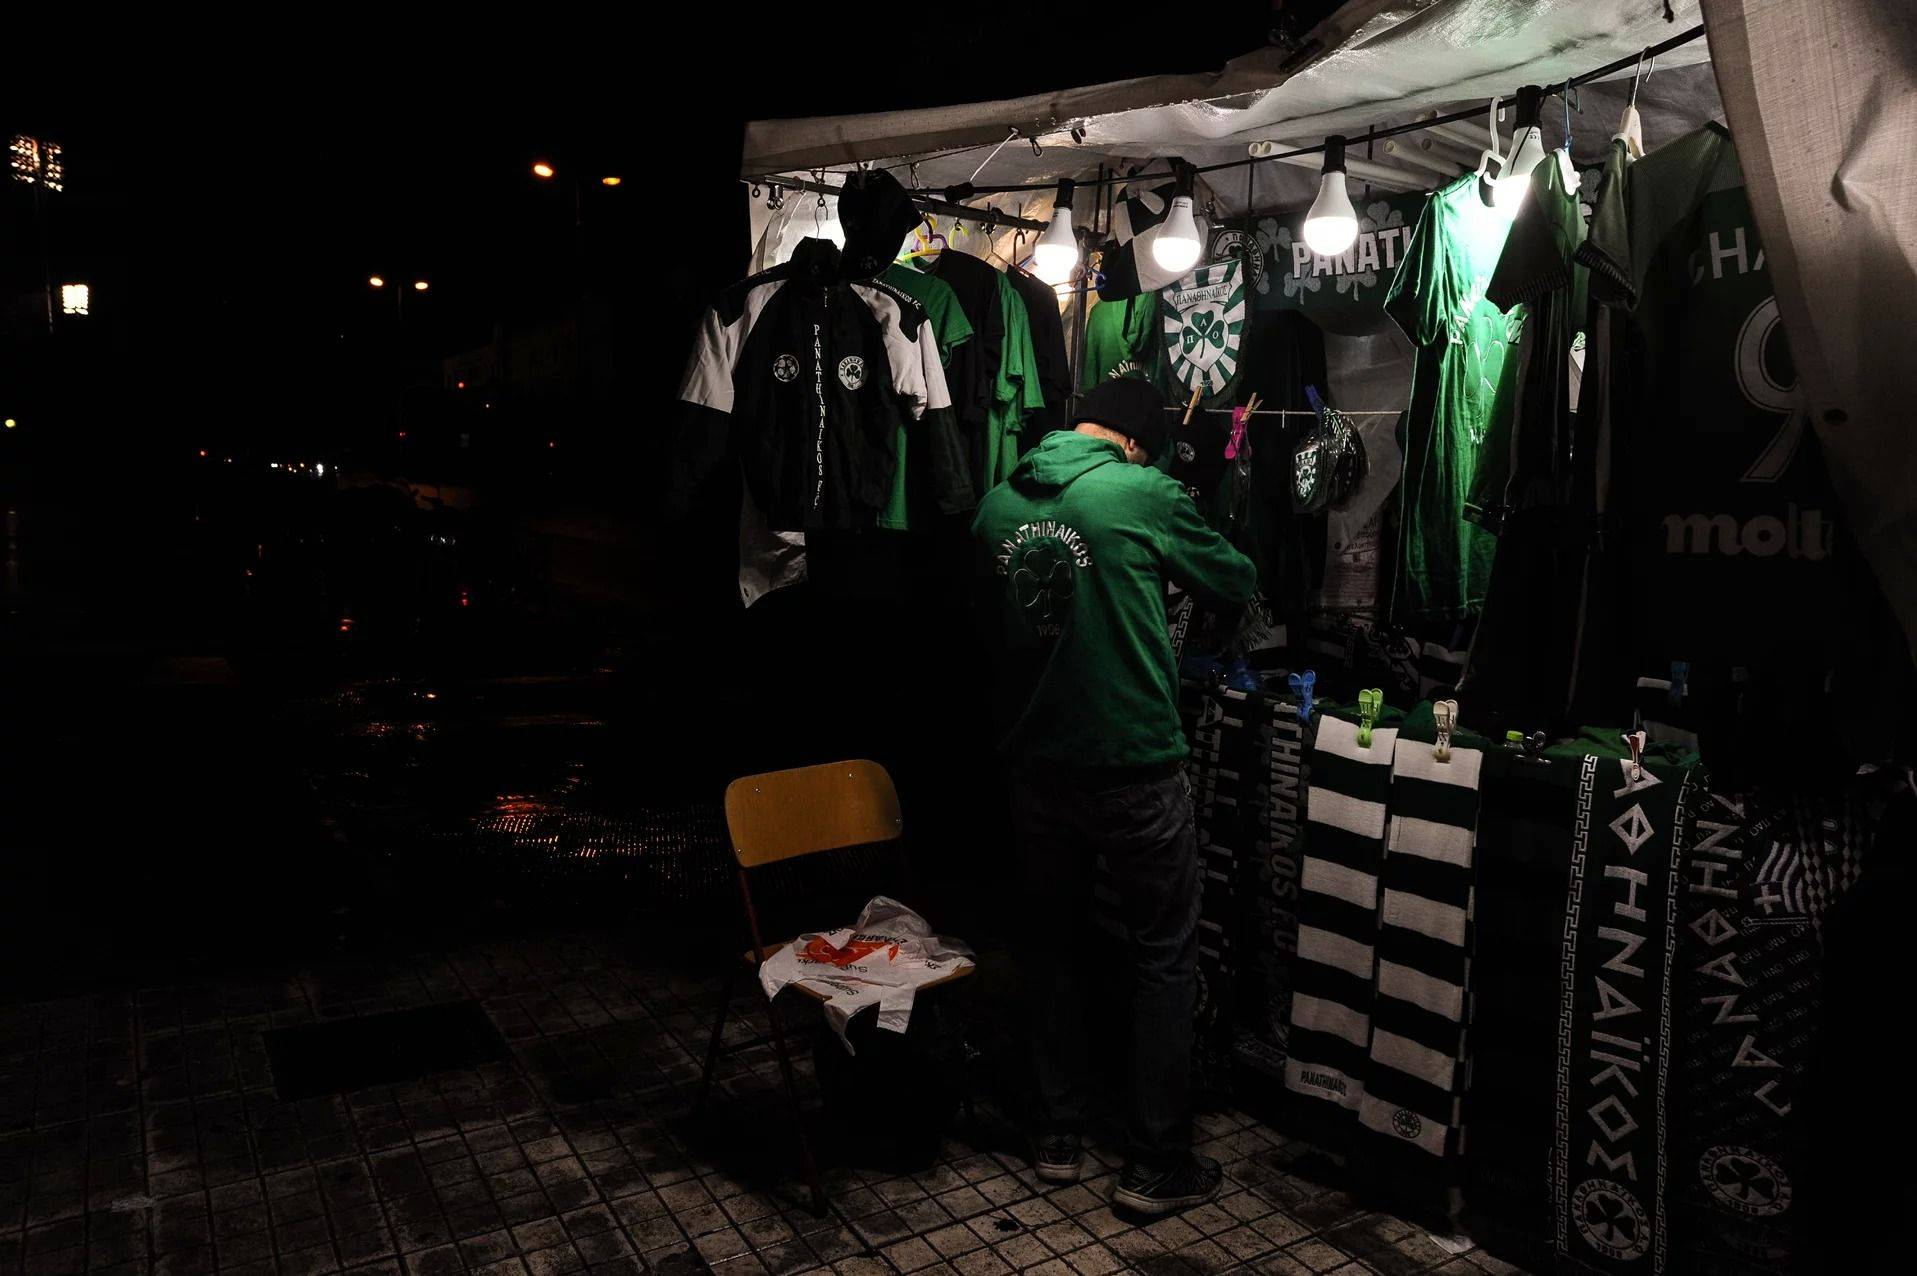 На улицах Афин во время матча Панатинаикоса - Stone Forest